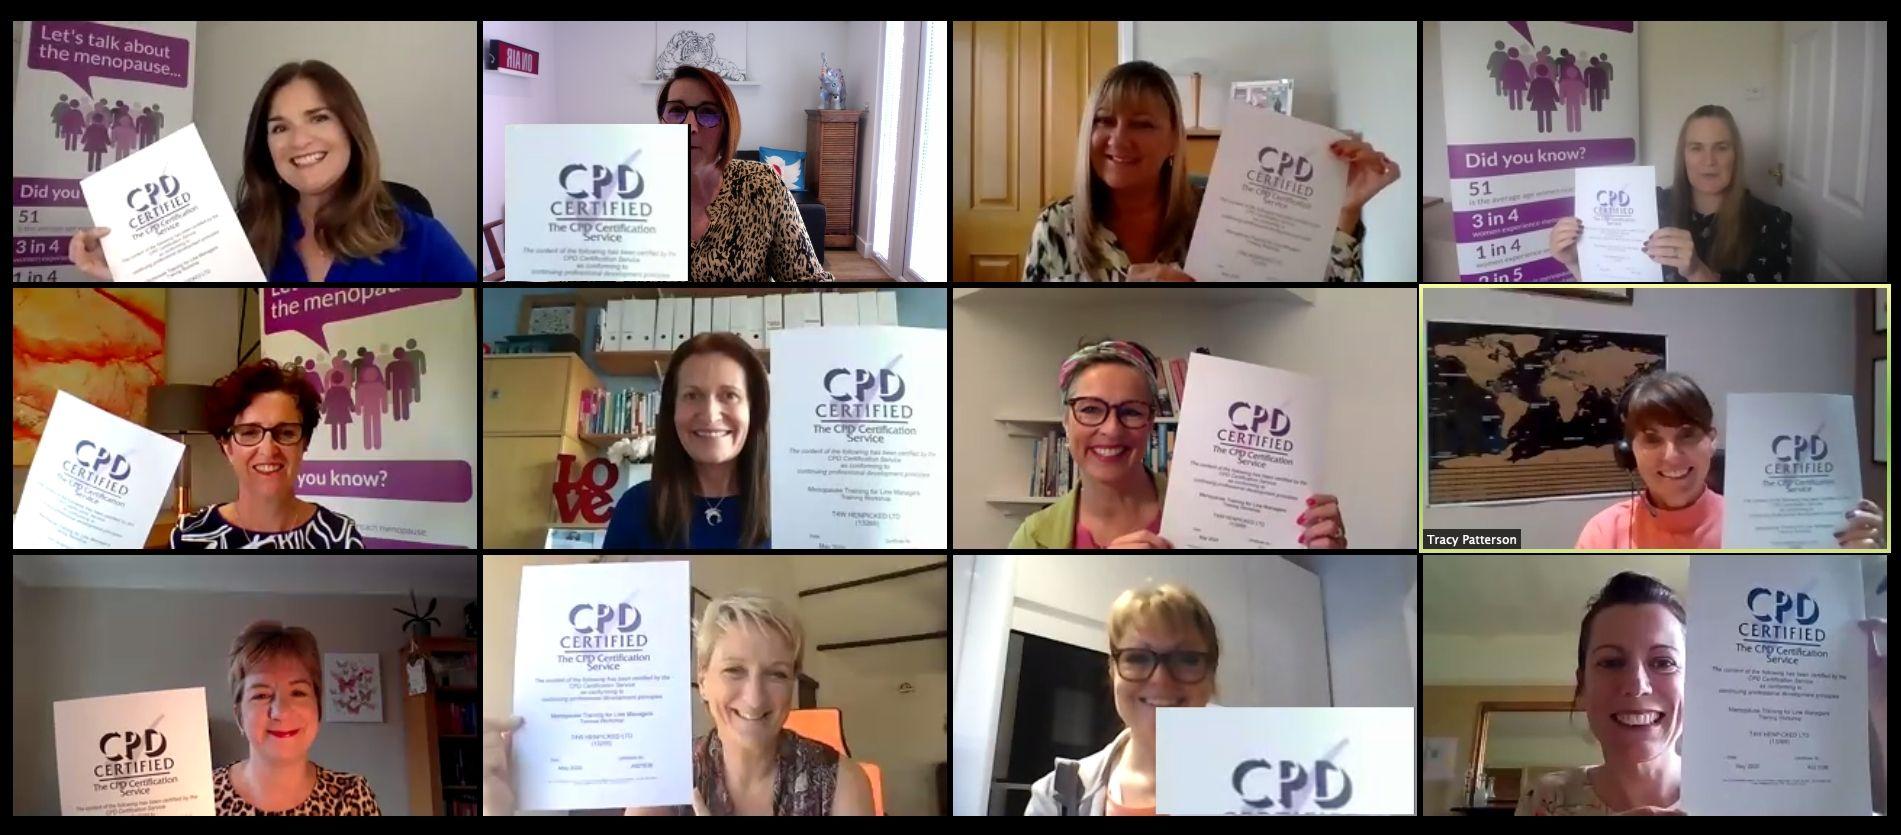 menopause, training, CPD Accreditation